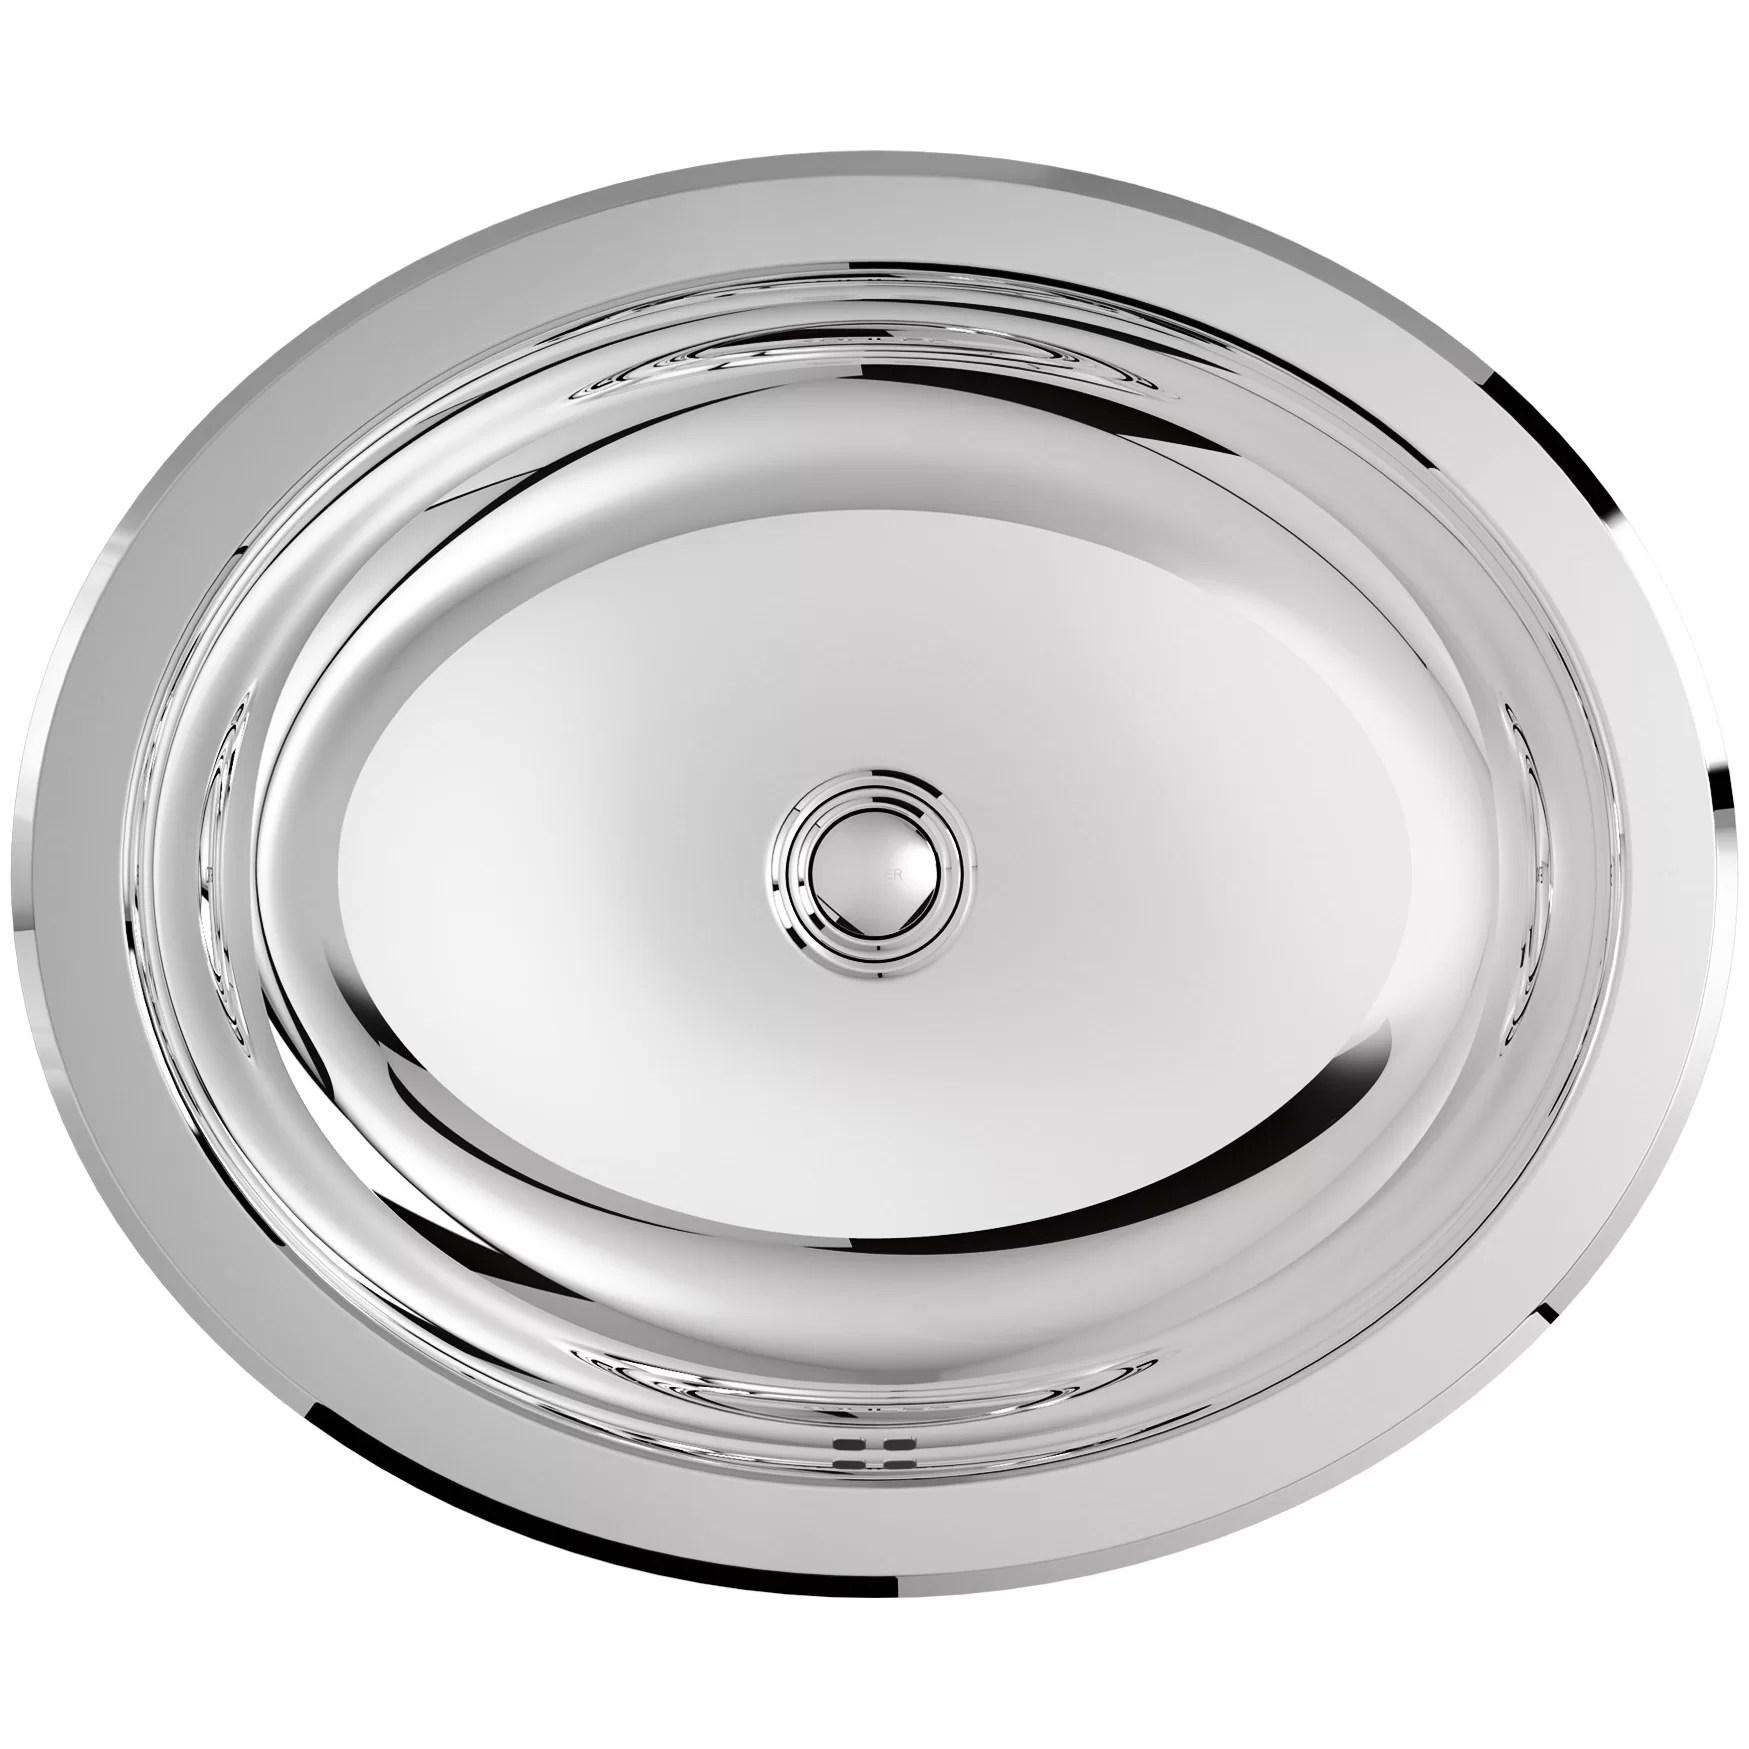 Kohler Bachata Drop InUndermount Bathroom Sink With